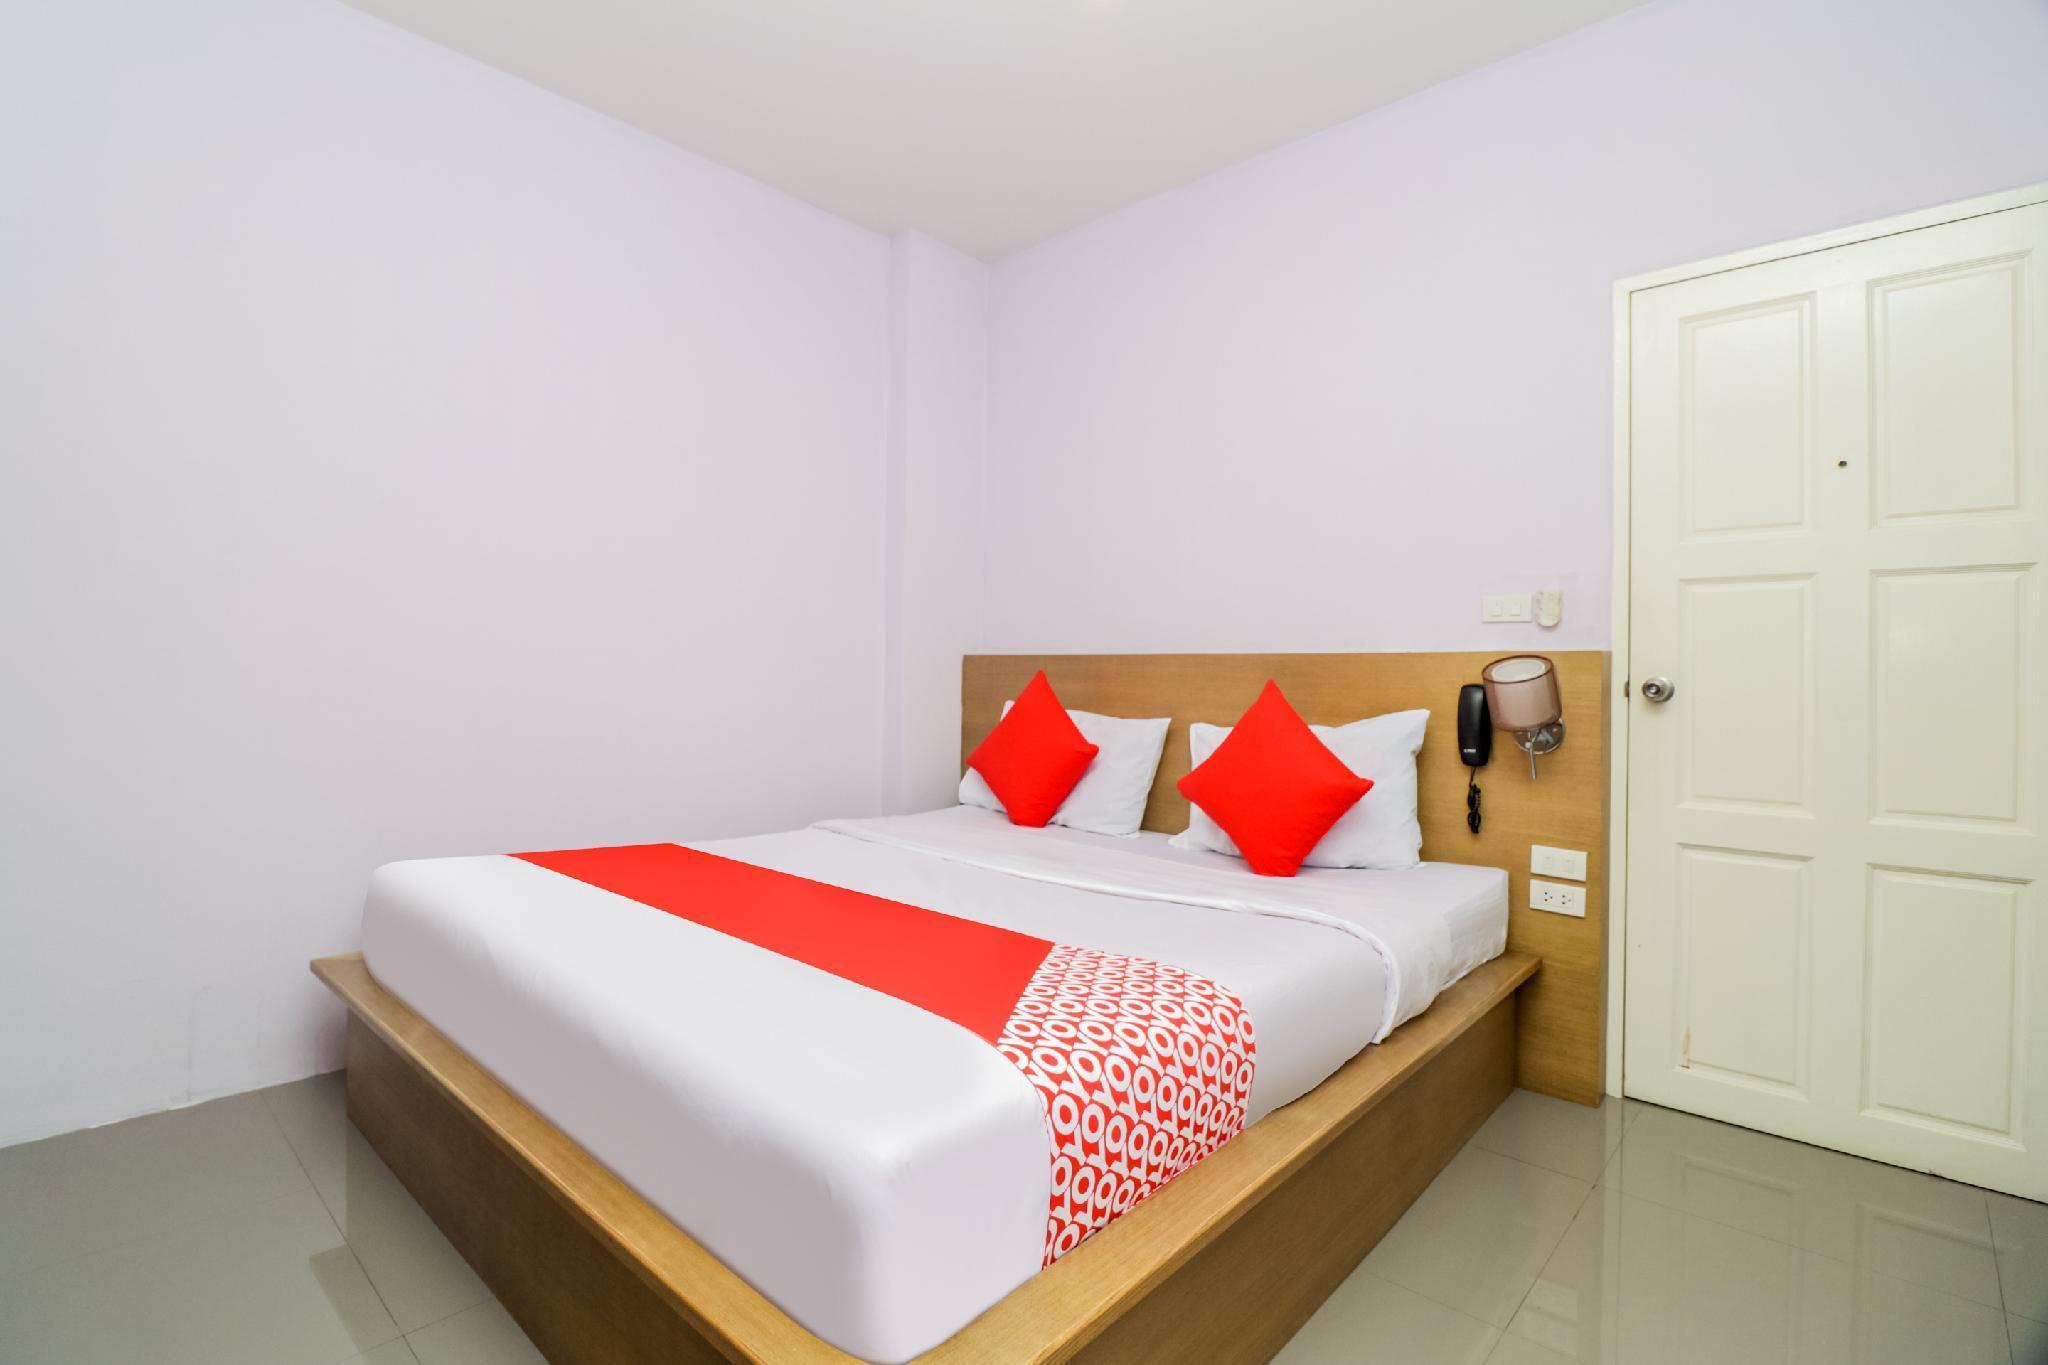 OYO 127 D-well Residence Hotel โอโย 127 ดี-เวลล์ เรสซิเดนซ์ โฮเต็ล